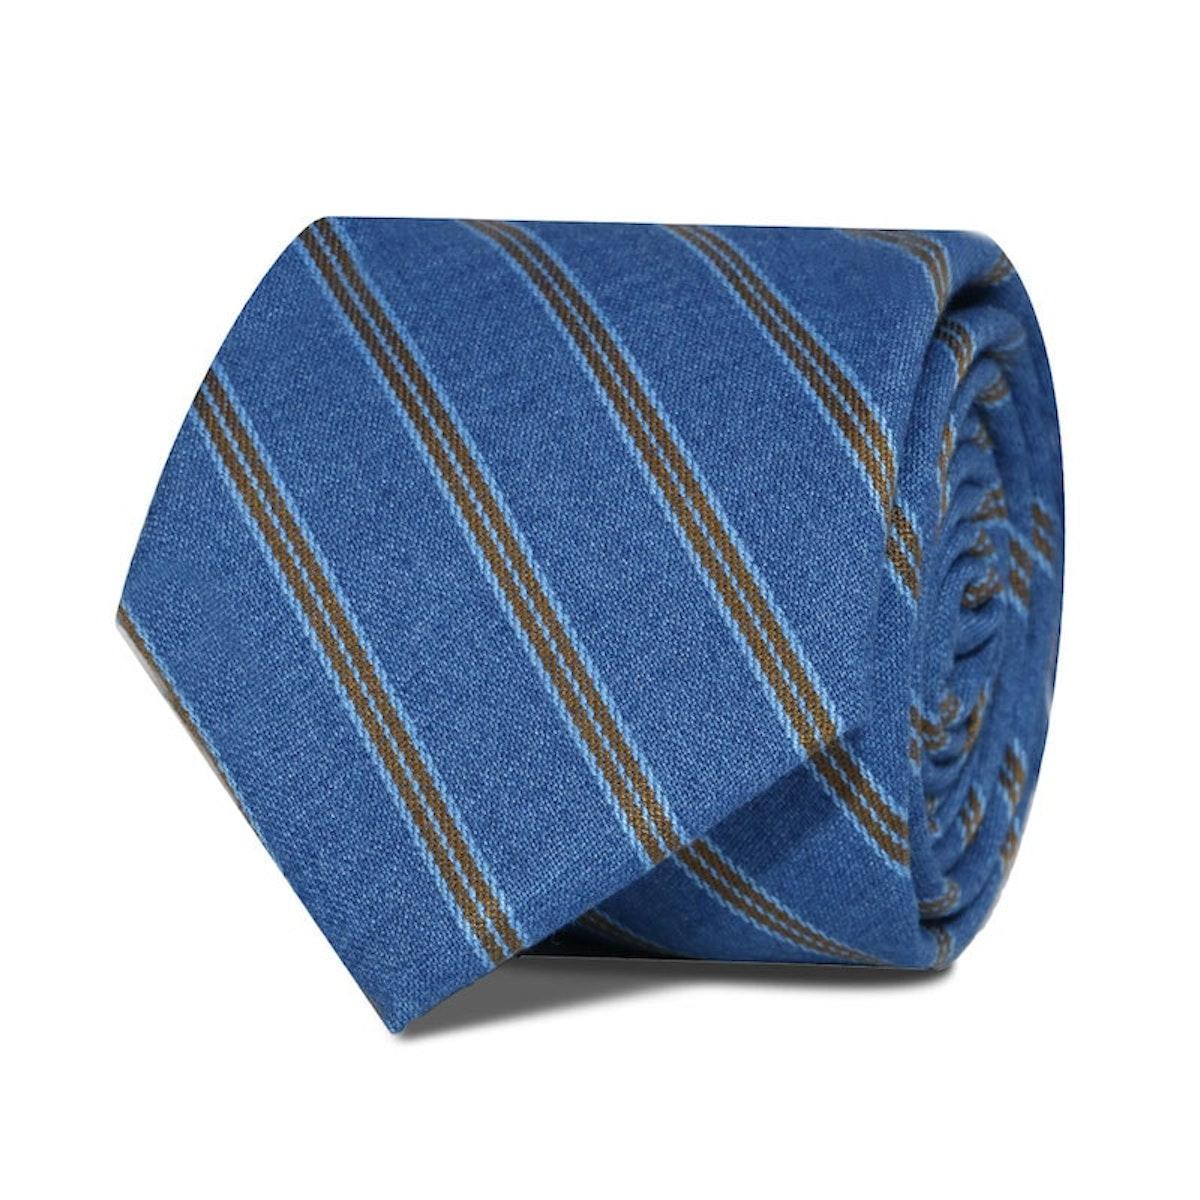 InStitchu Accessories Taylors Striped Mid Blue Cotton Tie